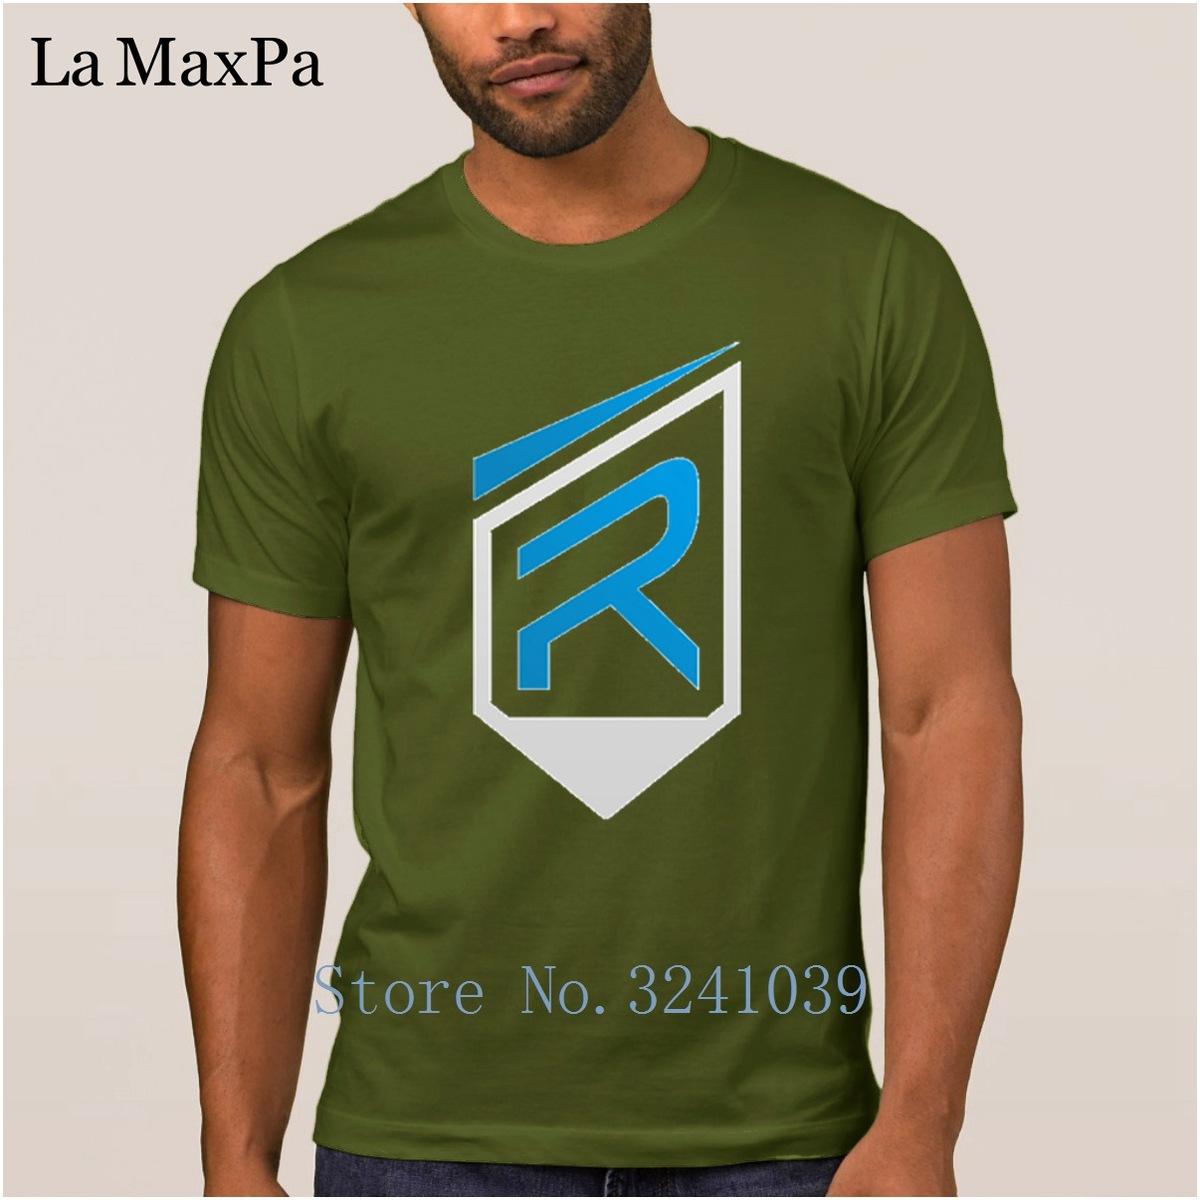 Designs Nice T Shirt For Men 100% Cotton Sunlight Men Tshirt Russogames Apparel T-Shirt Graphic S-3xl Top Quality